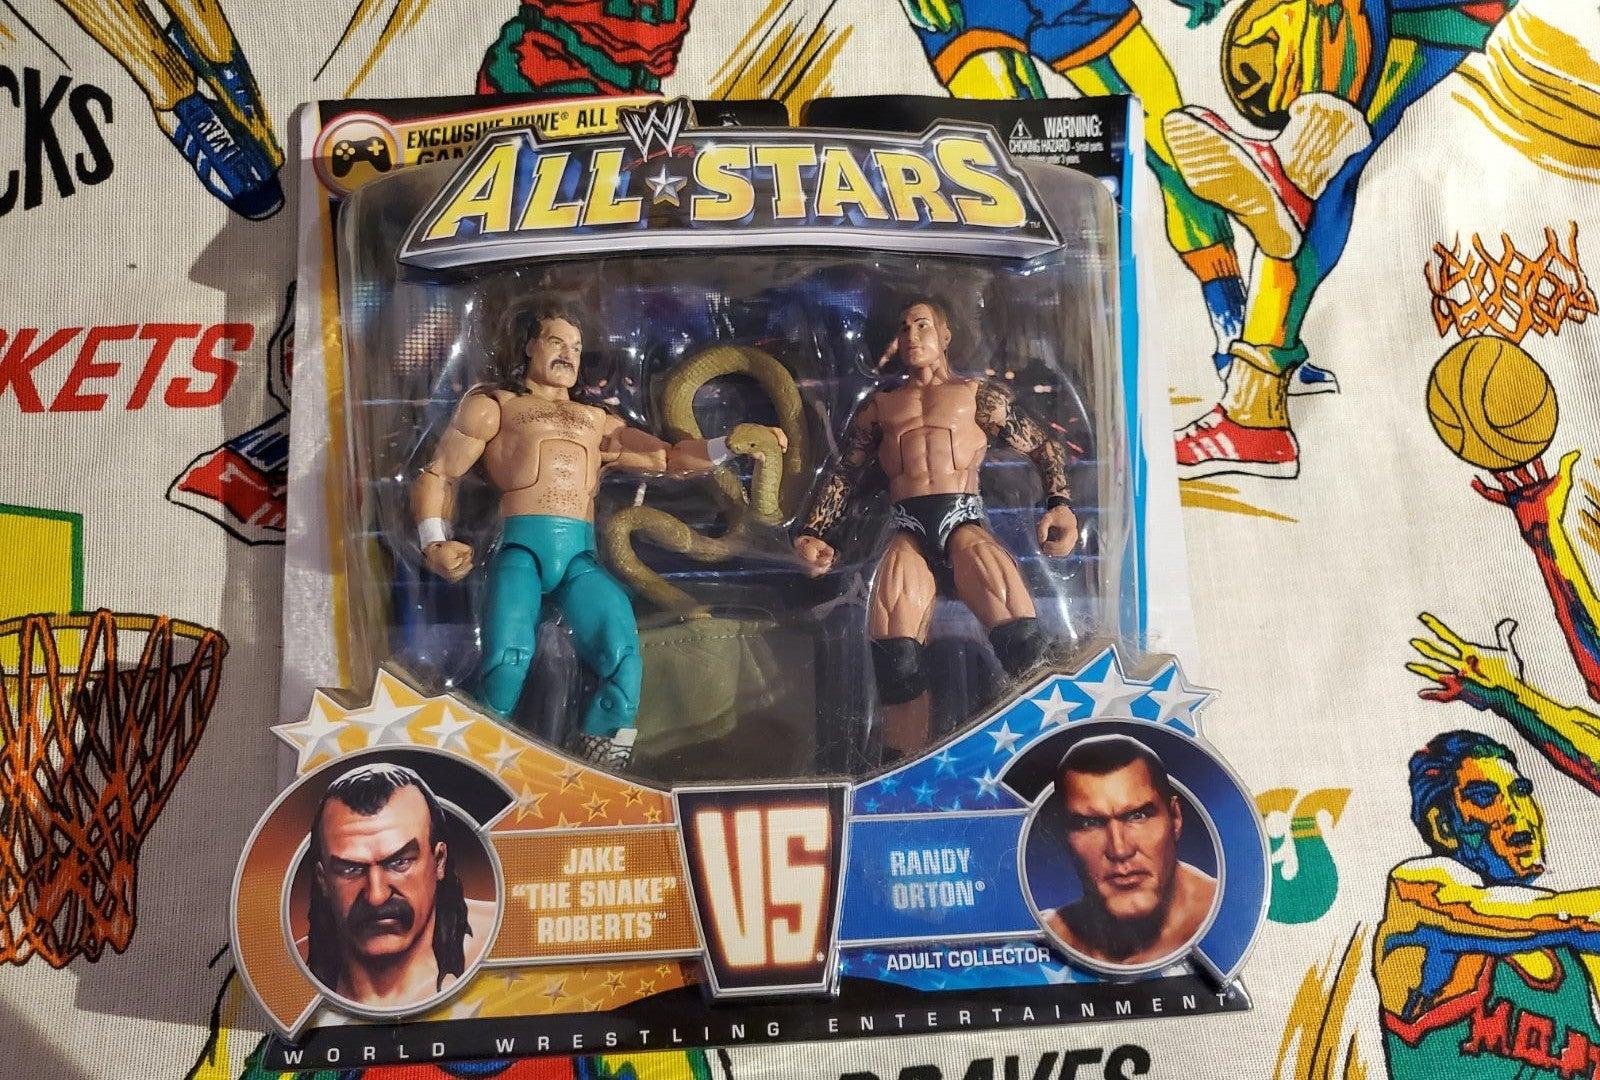 Wwe All Stars: Randy Orton vs Jake Rober